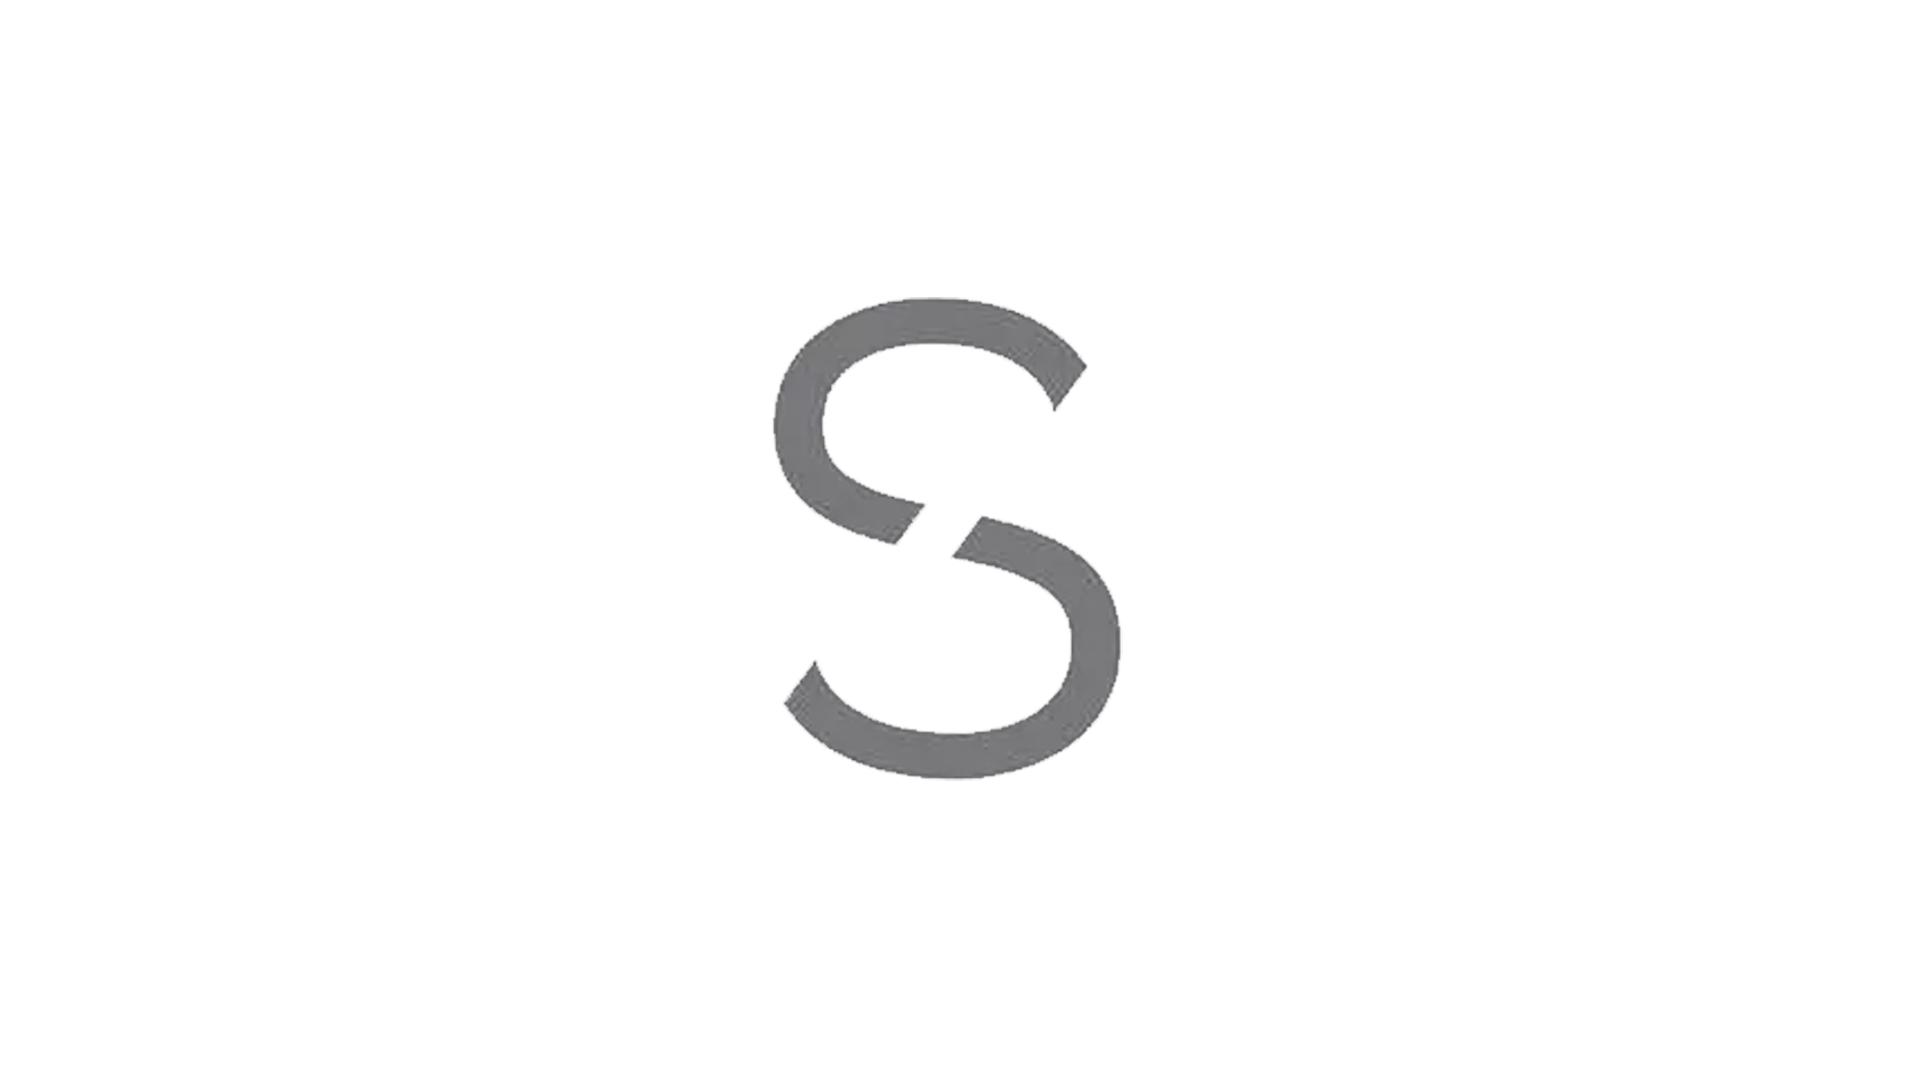 Fantastisch Liegendes Logo Galerie - Schaltplan-Ideen - mesoul.info